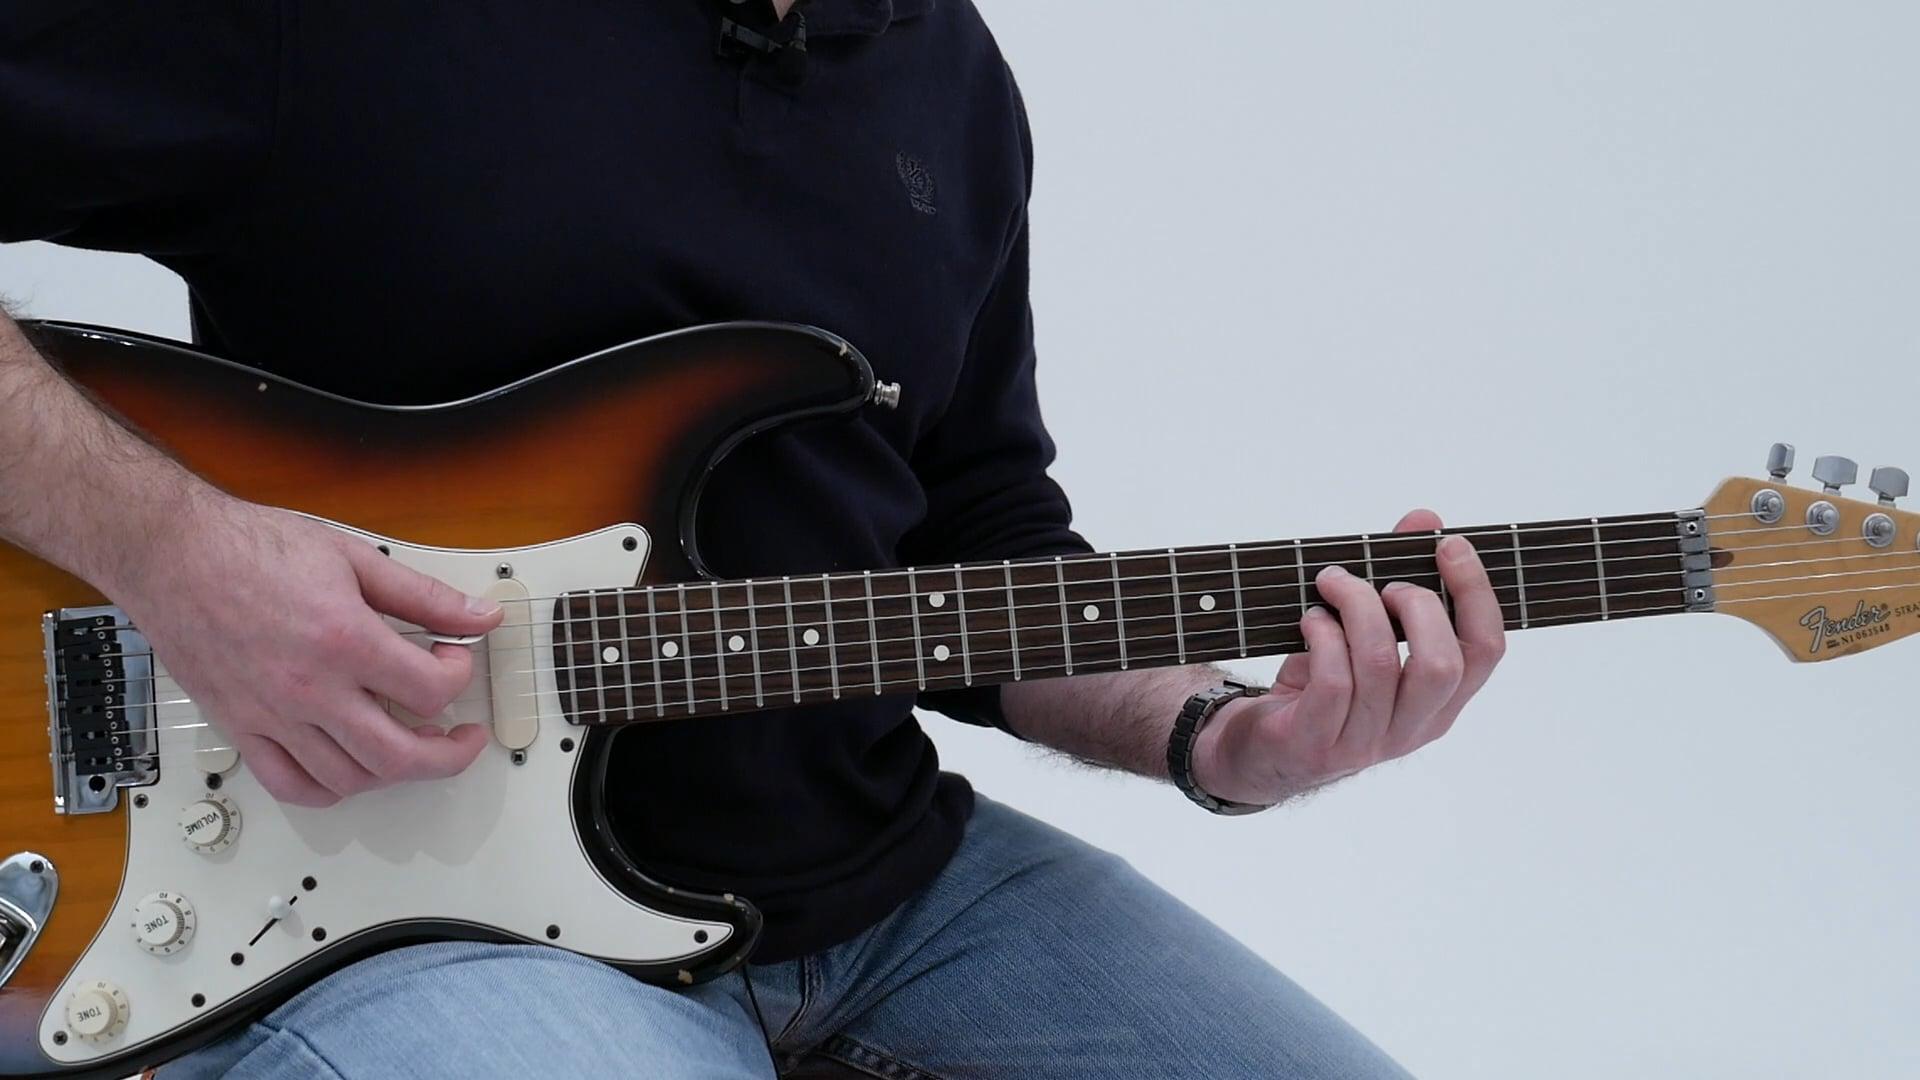 C Major 7 chord